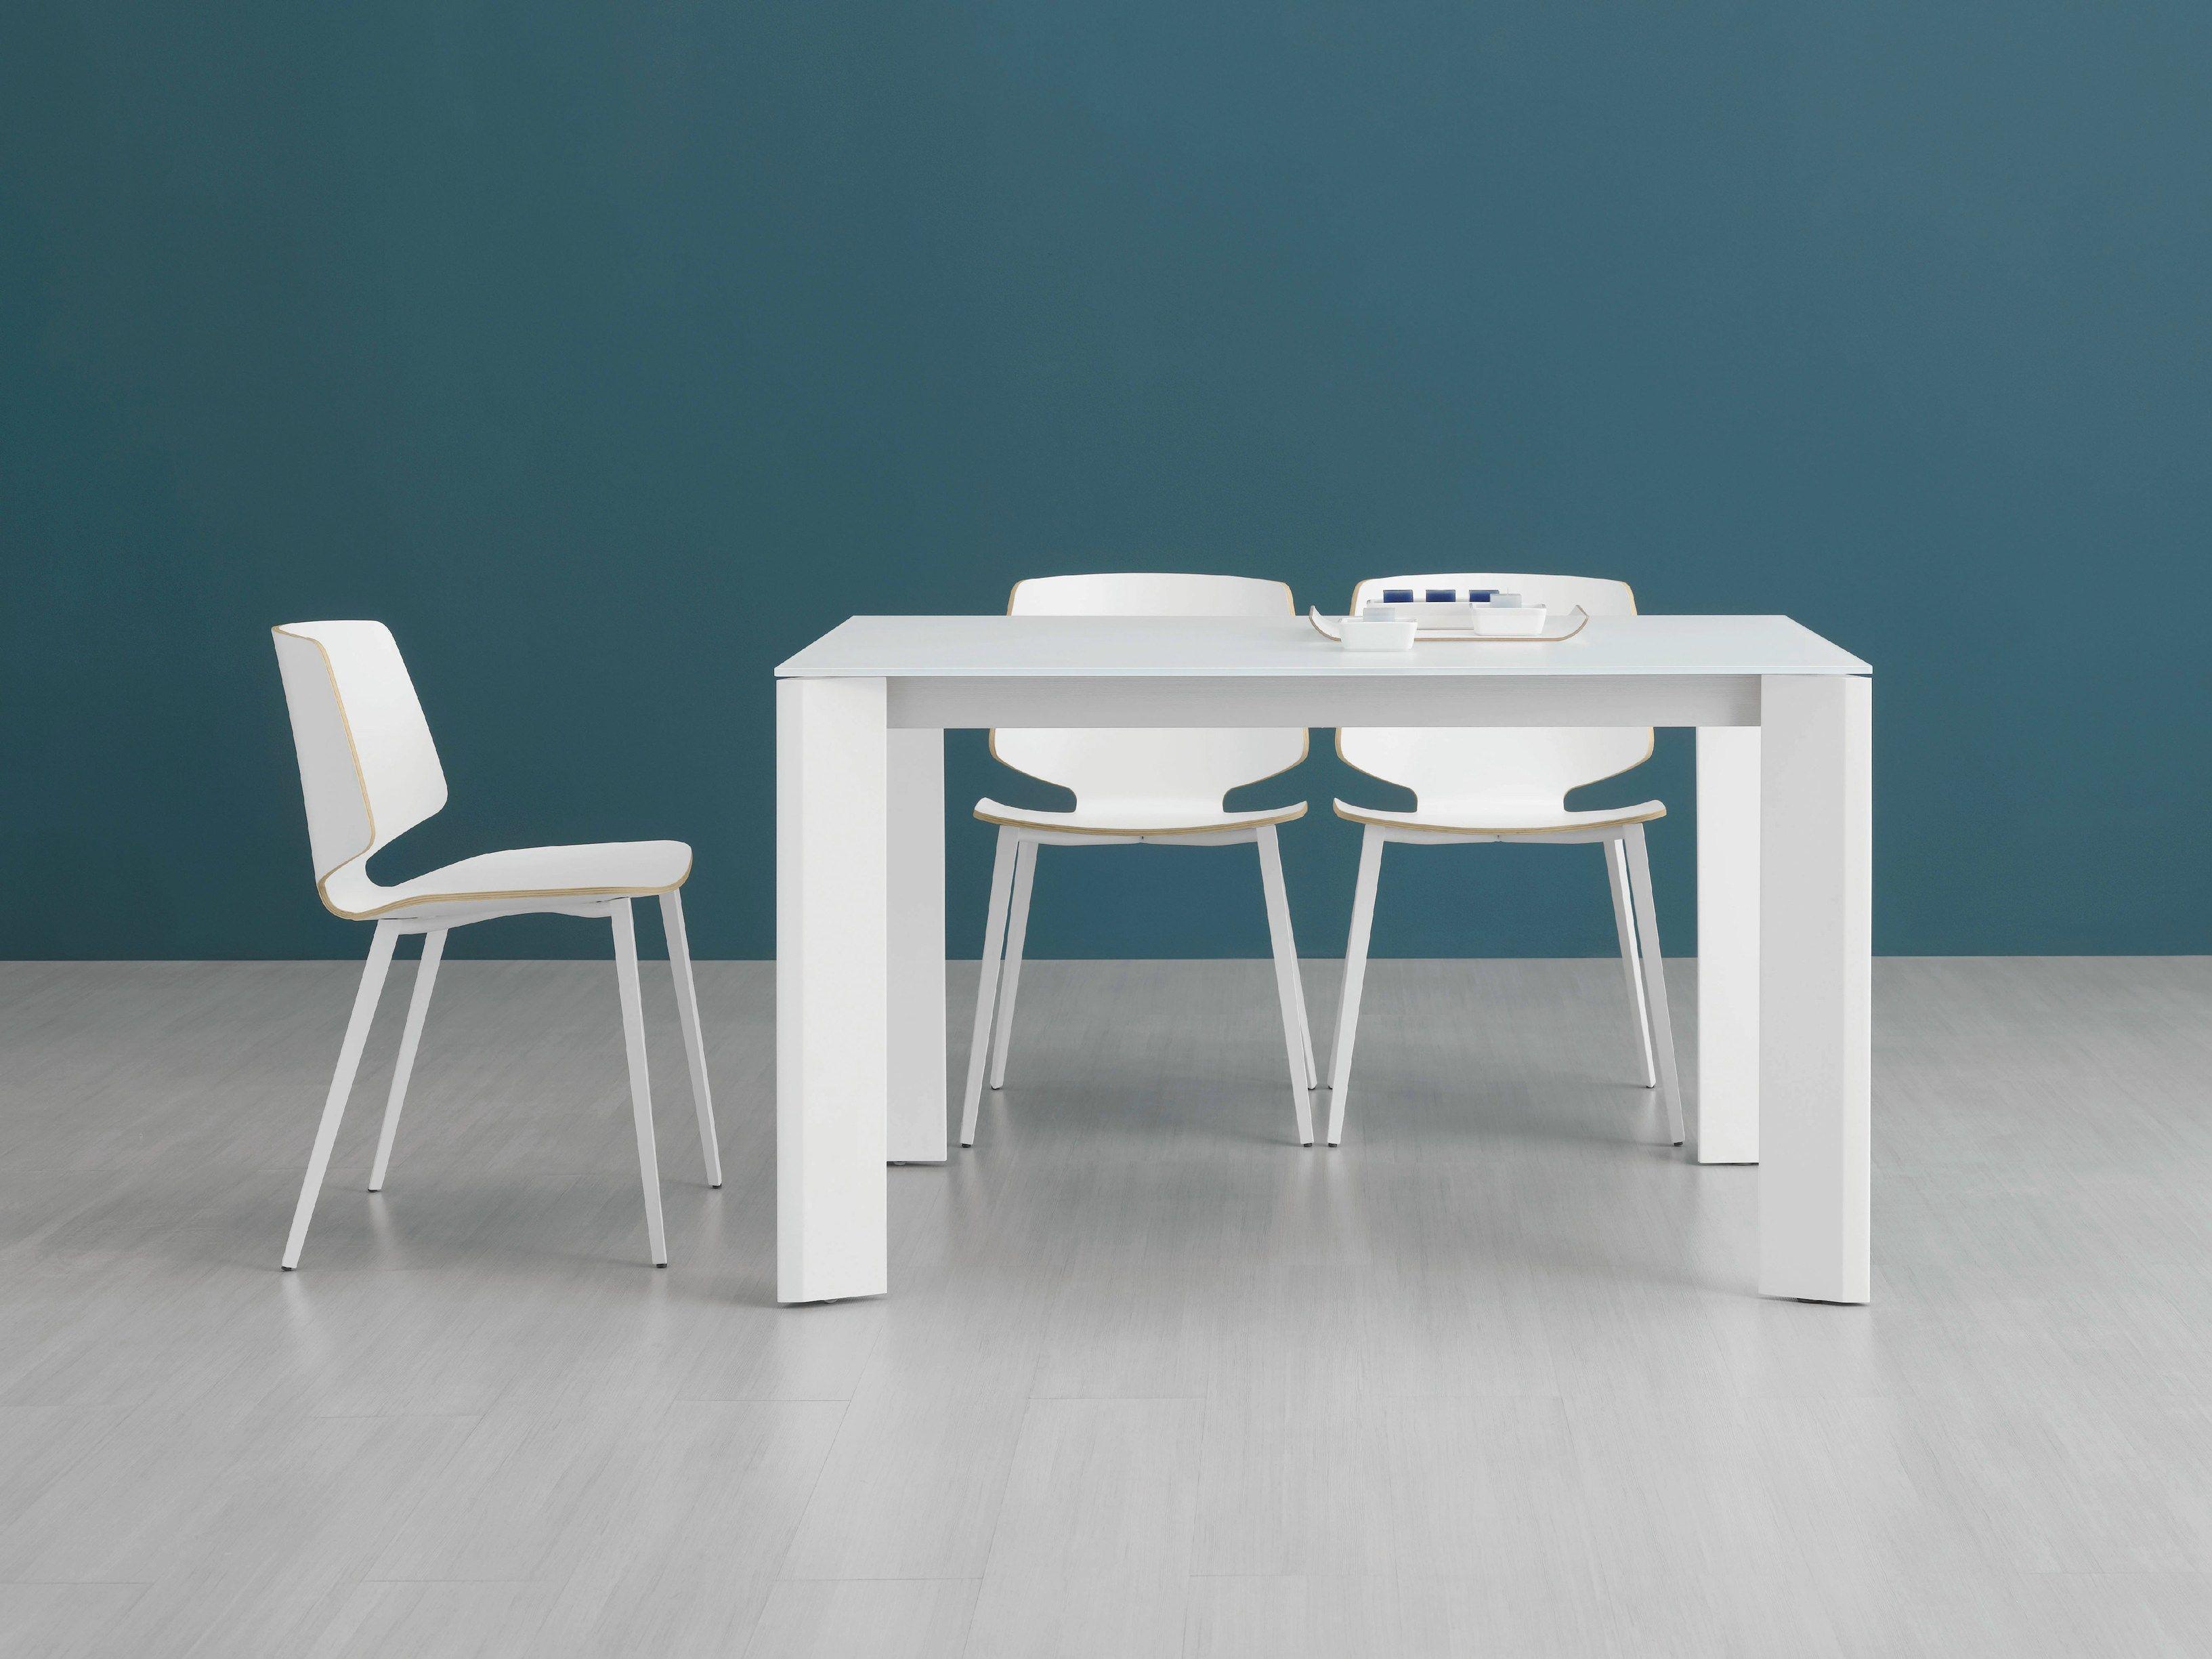 Fly tr sedia collezione sedie collection by domitalia for Sedie fenice design